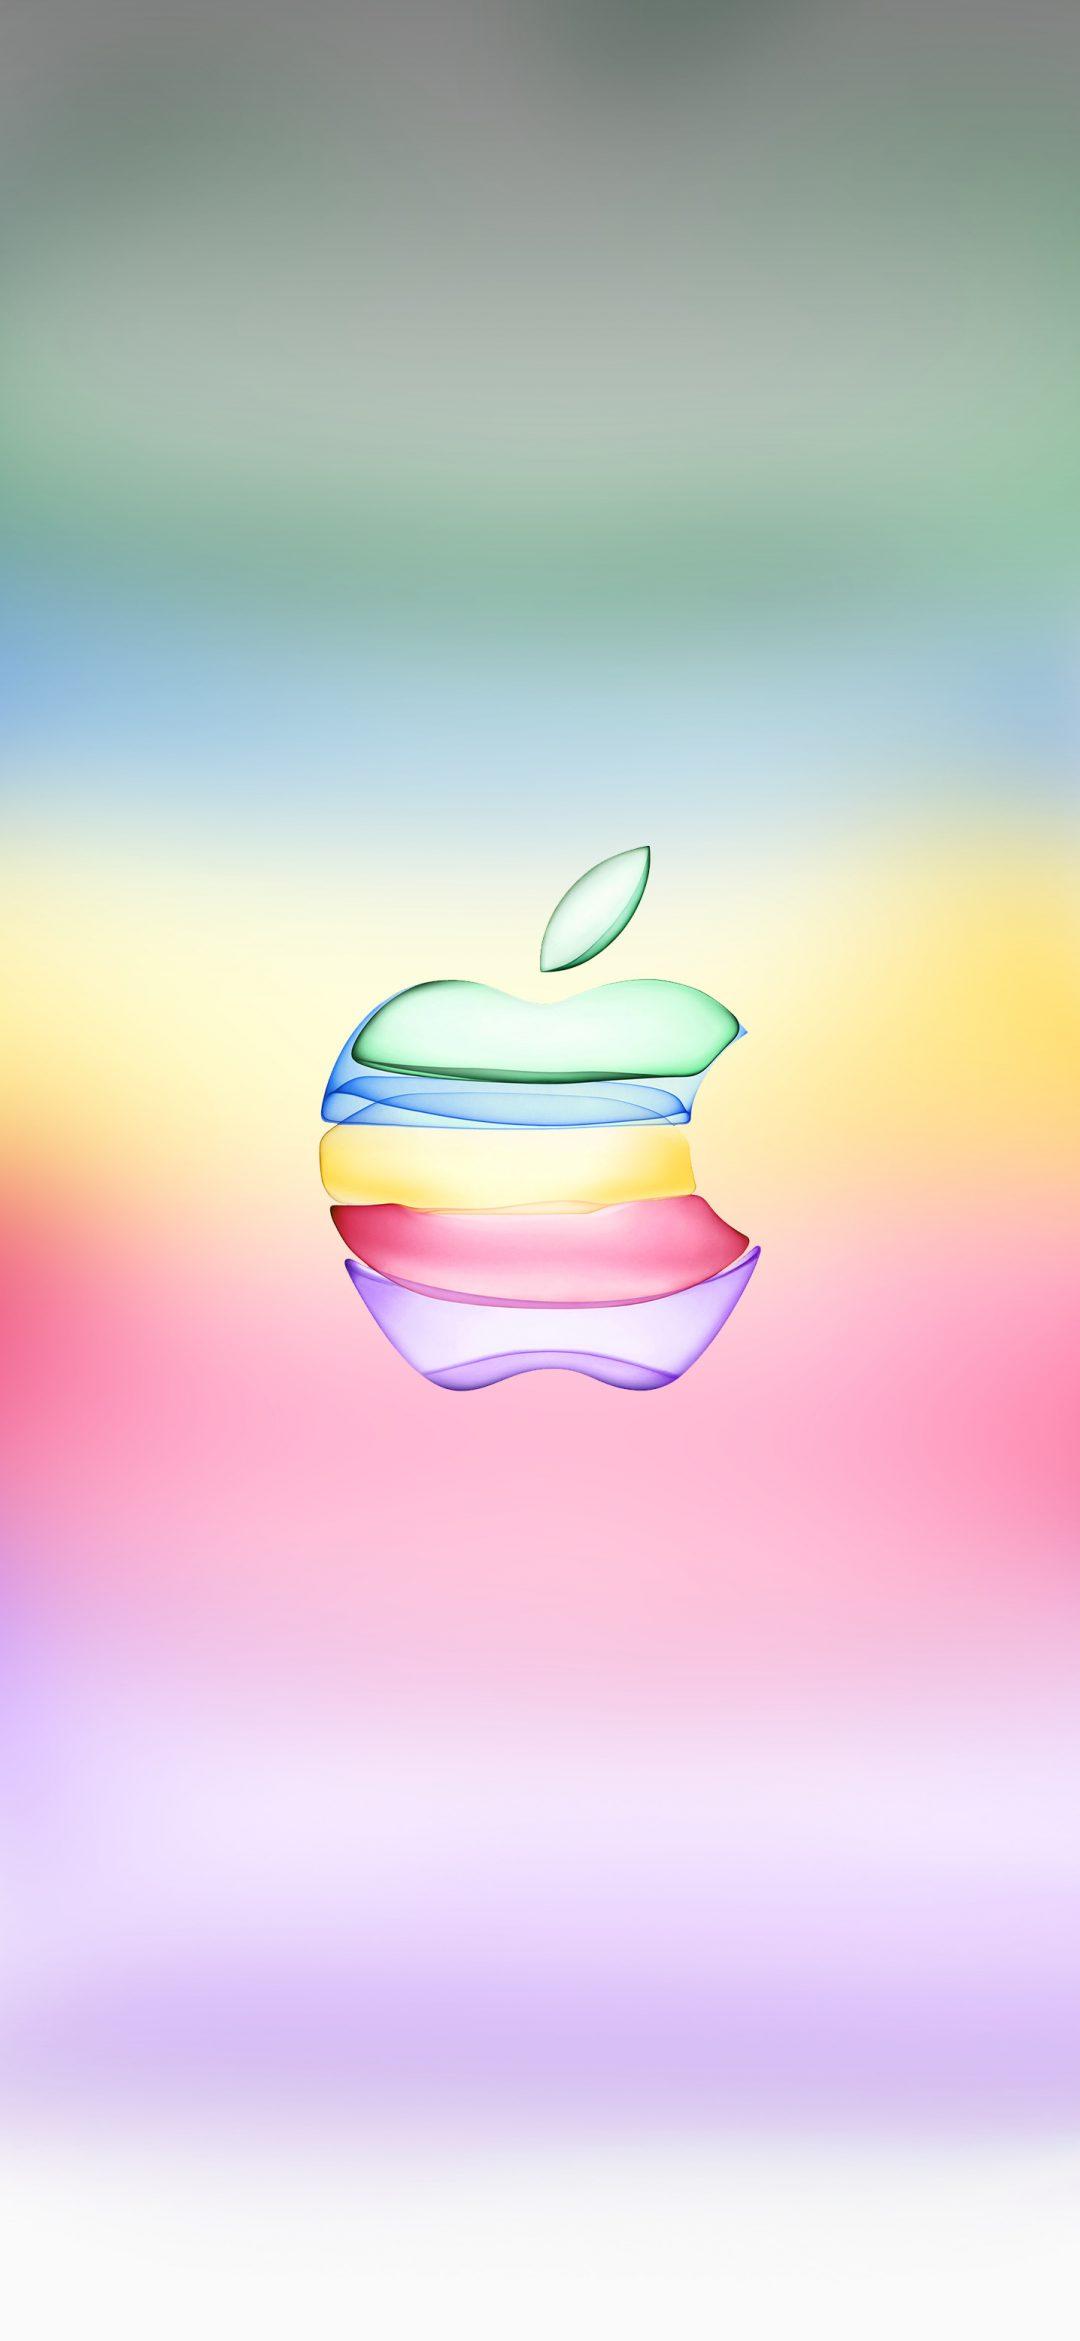 iphone-11-default-wallpaper-ardroiding-15